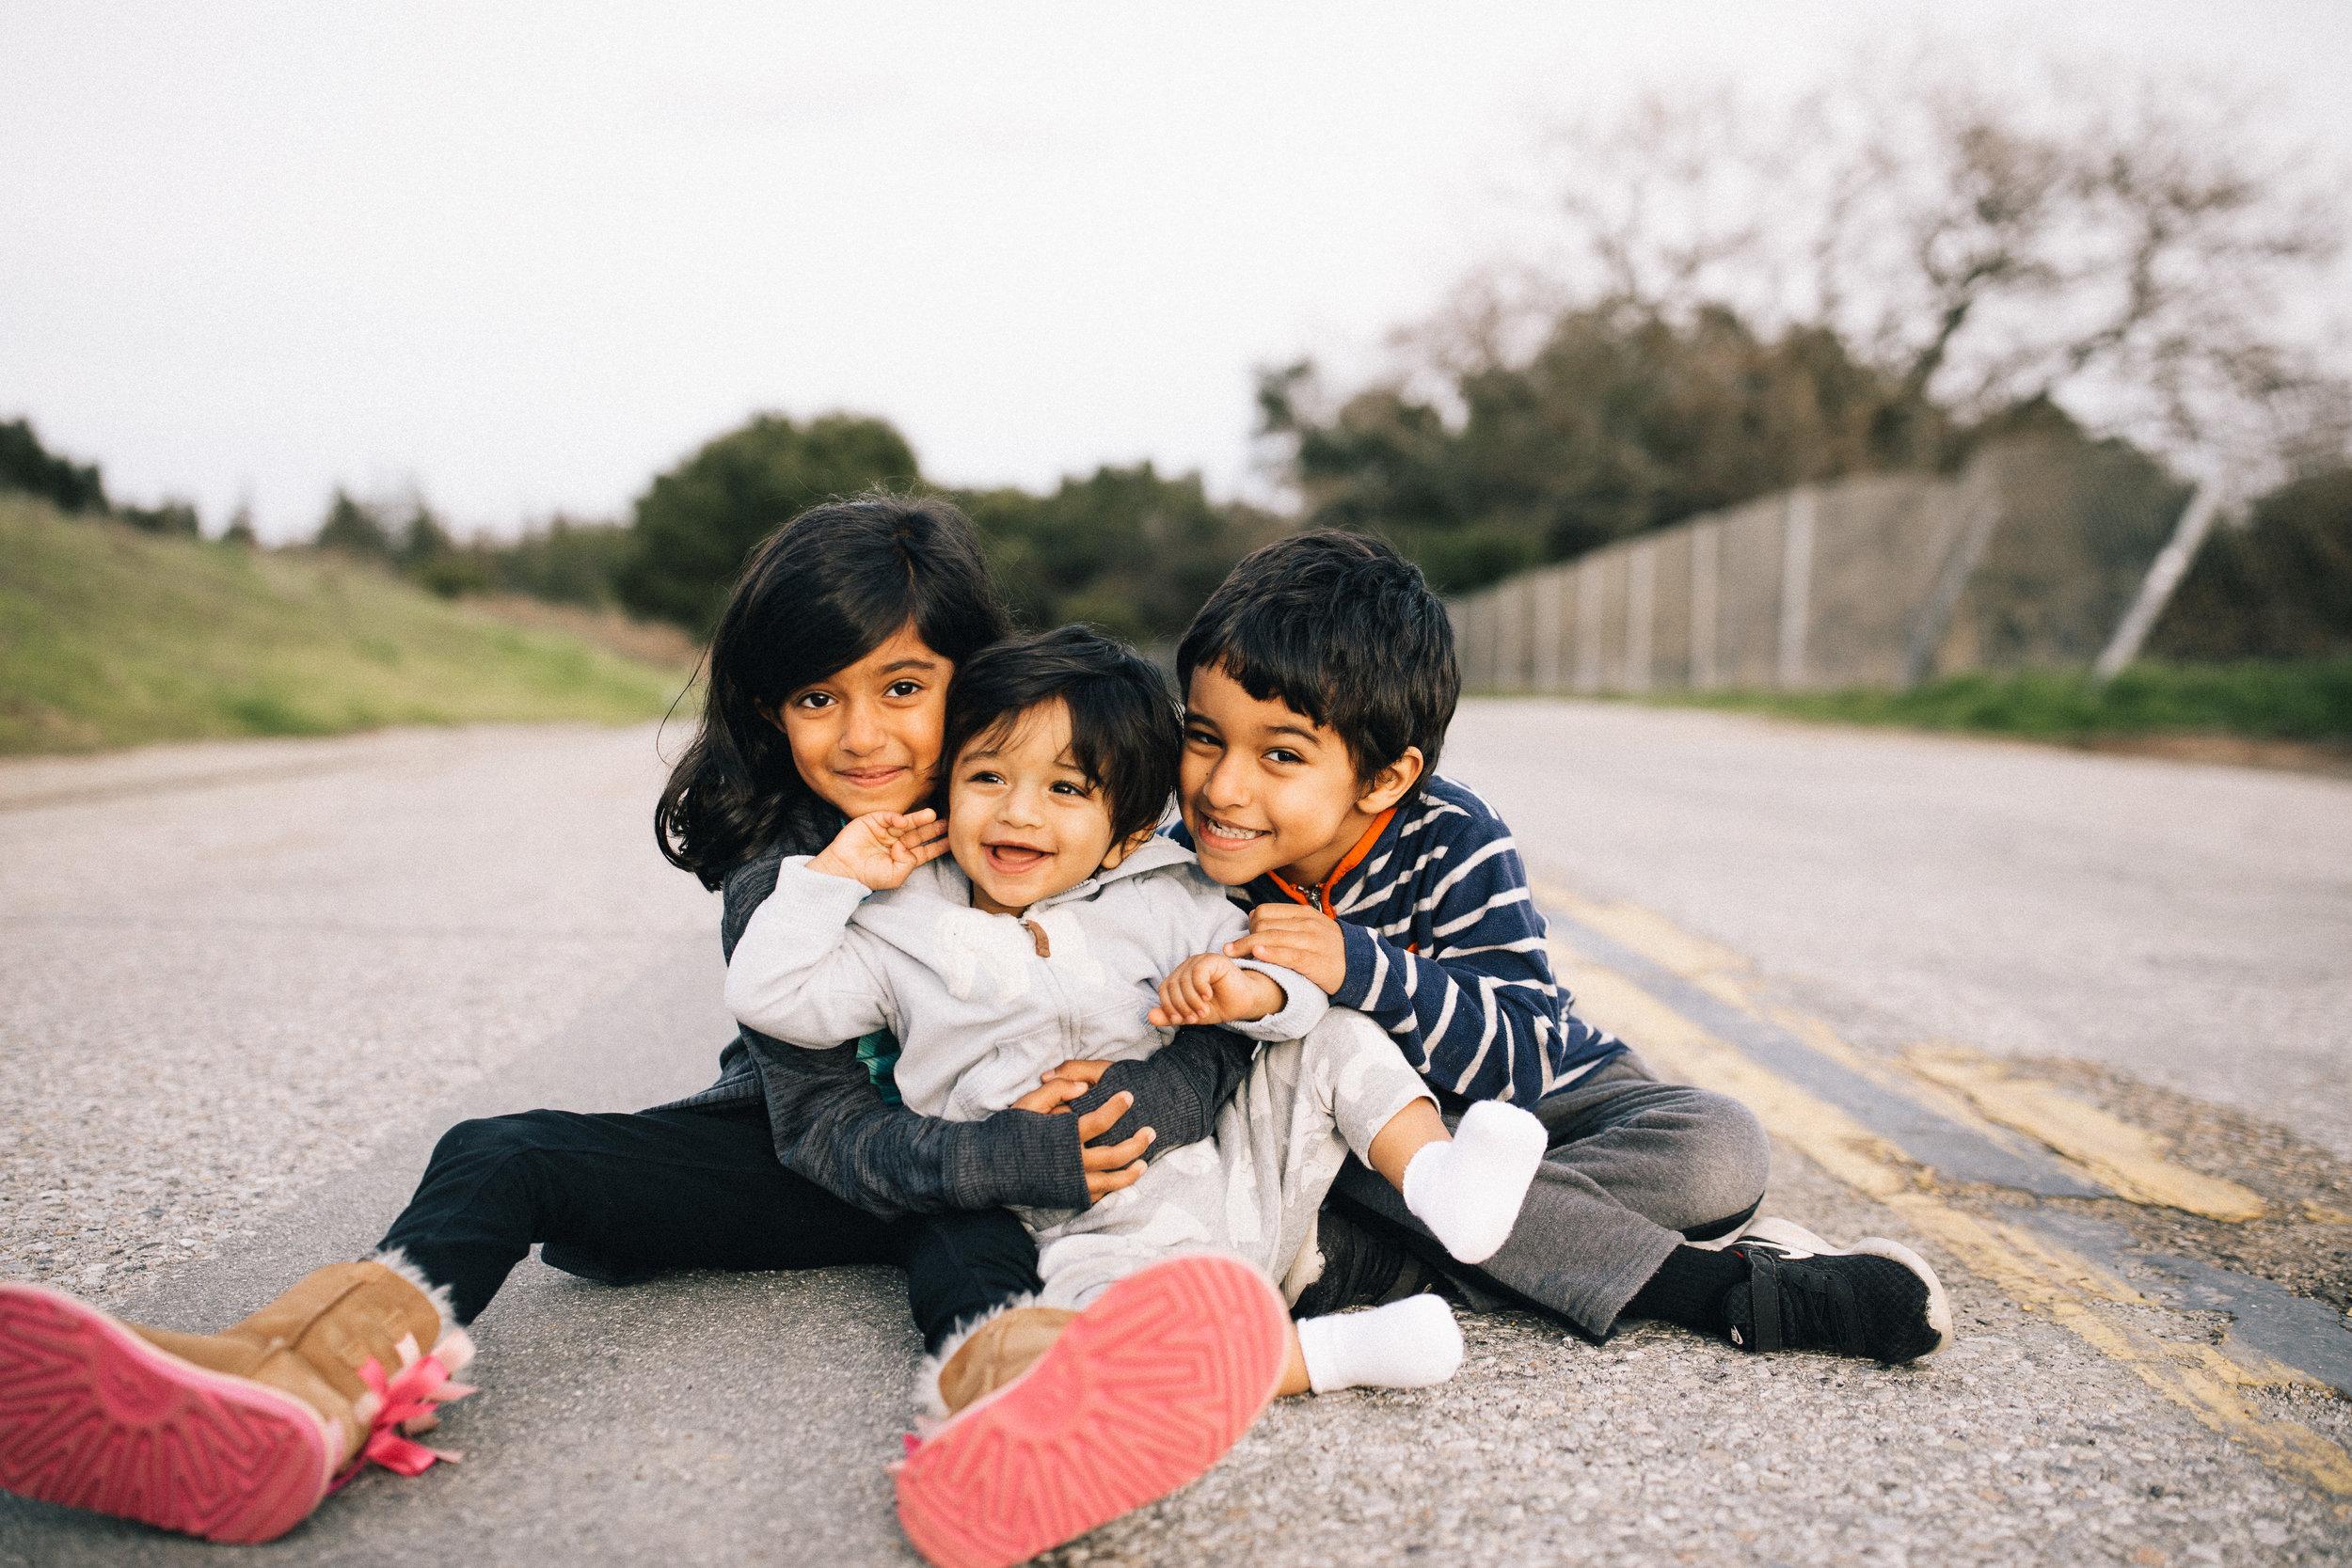 2018_01_01 Ahmad Family Session Blog Photos Edited Full Resolution 0006.jpg